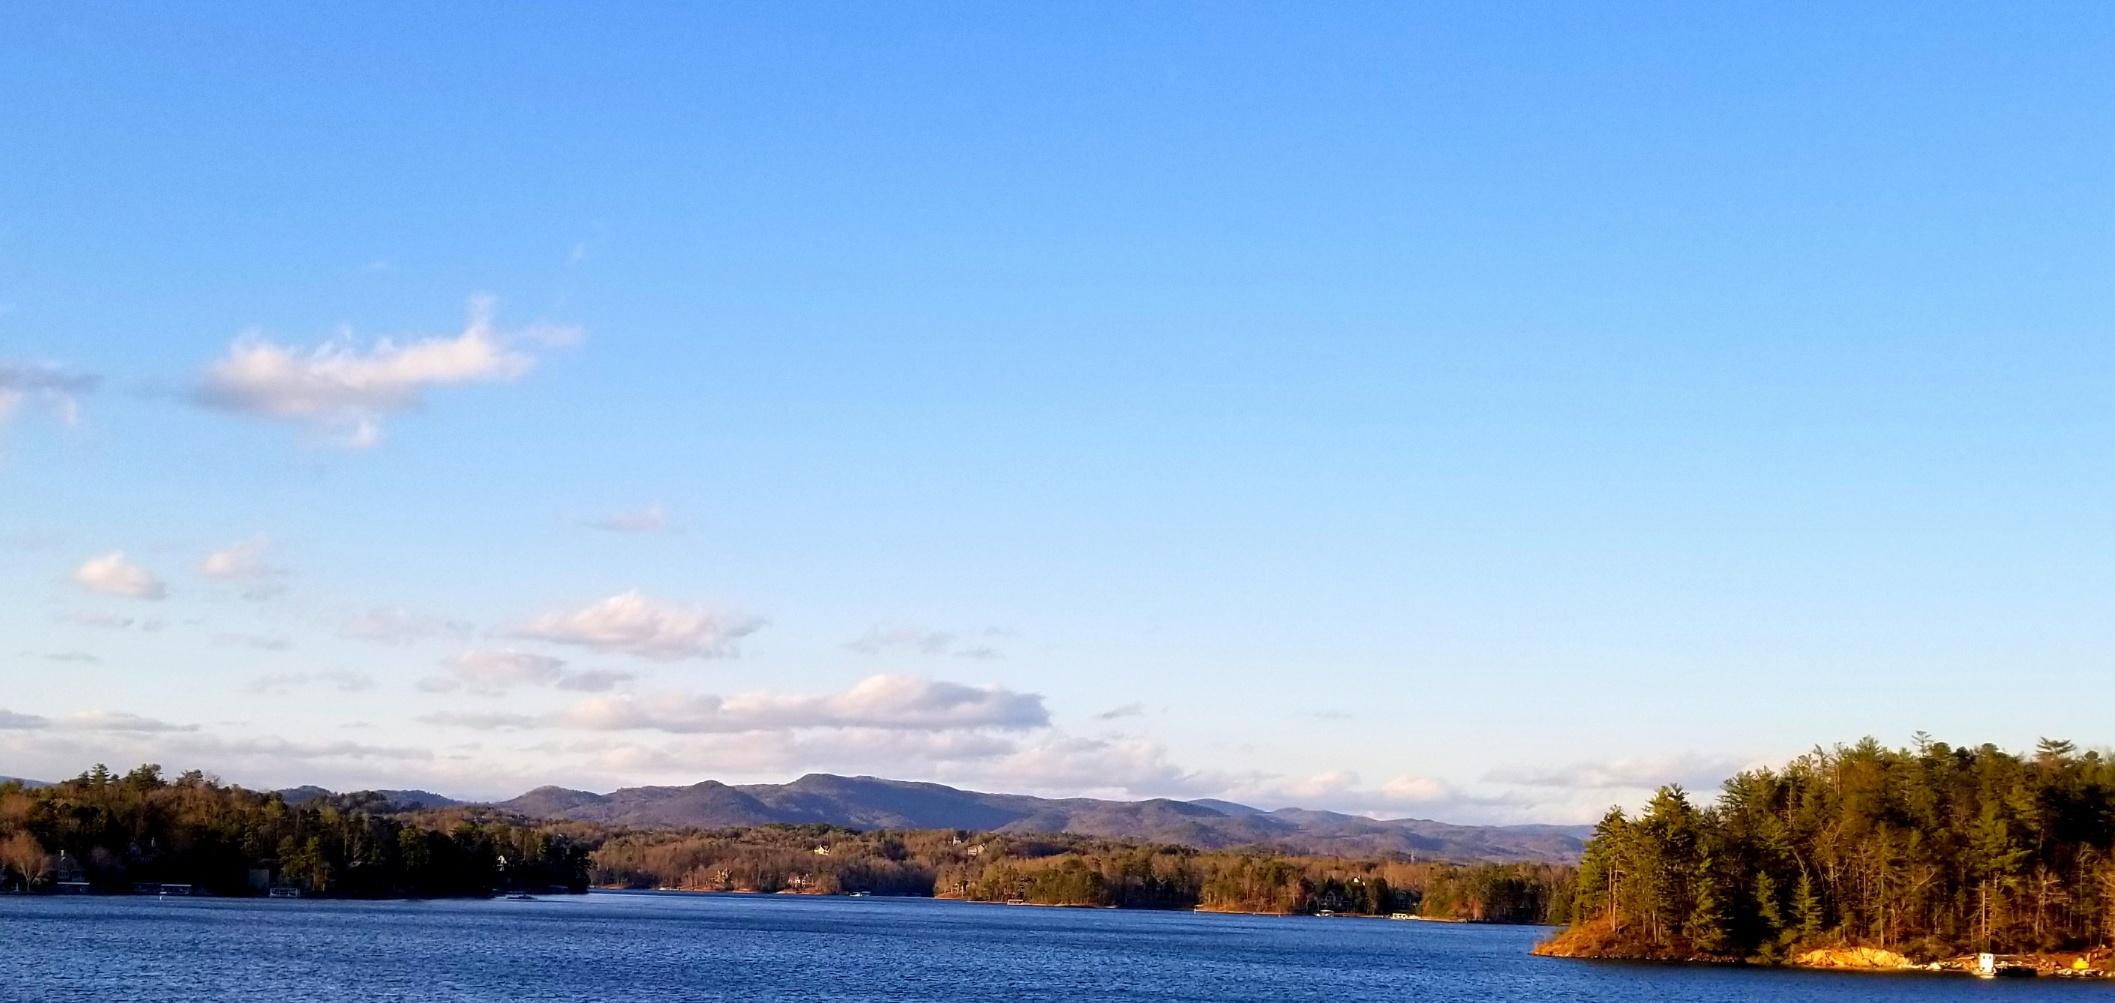 Lake Keowee Real Estate Expert Blog No Time Like NOW